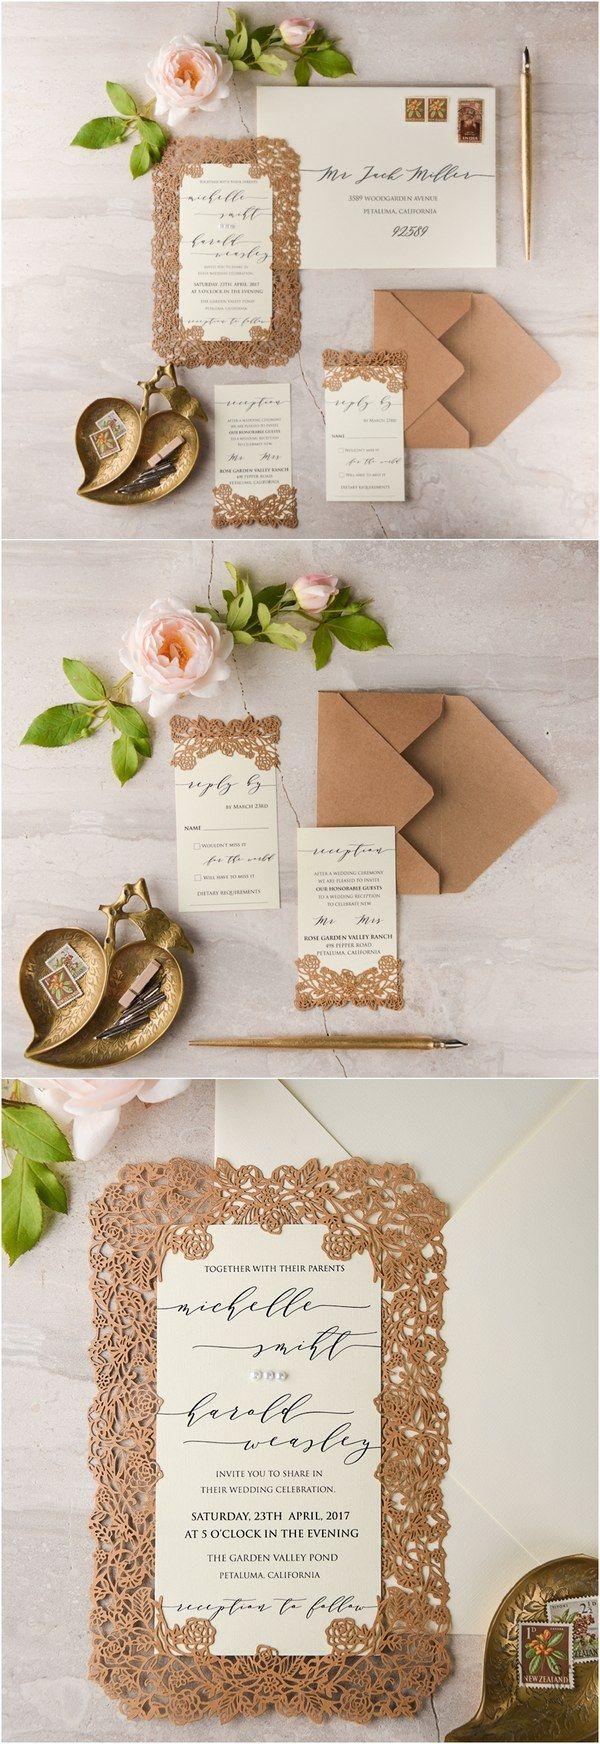 kraft paper laser cut wedding invitation kits 05LcutGz / http://www.deerpearlflowers.com/laser-cut-wedding-invitations/3/